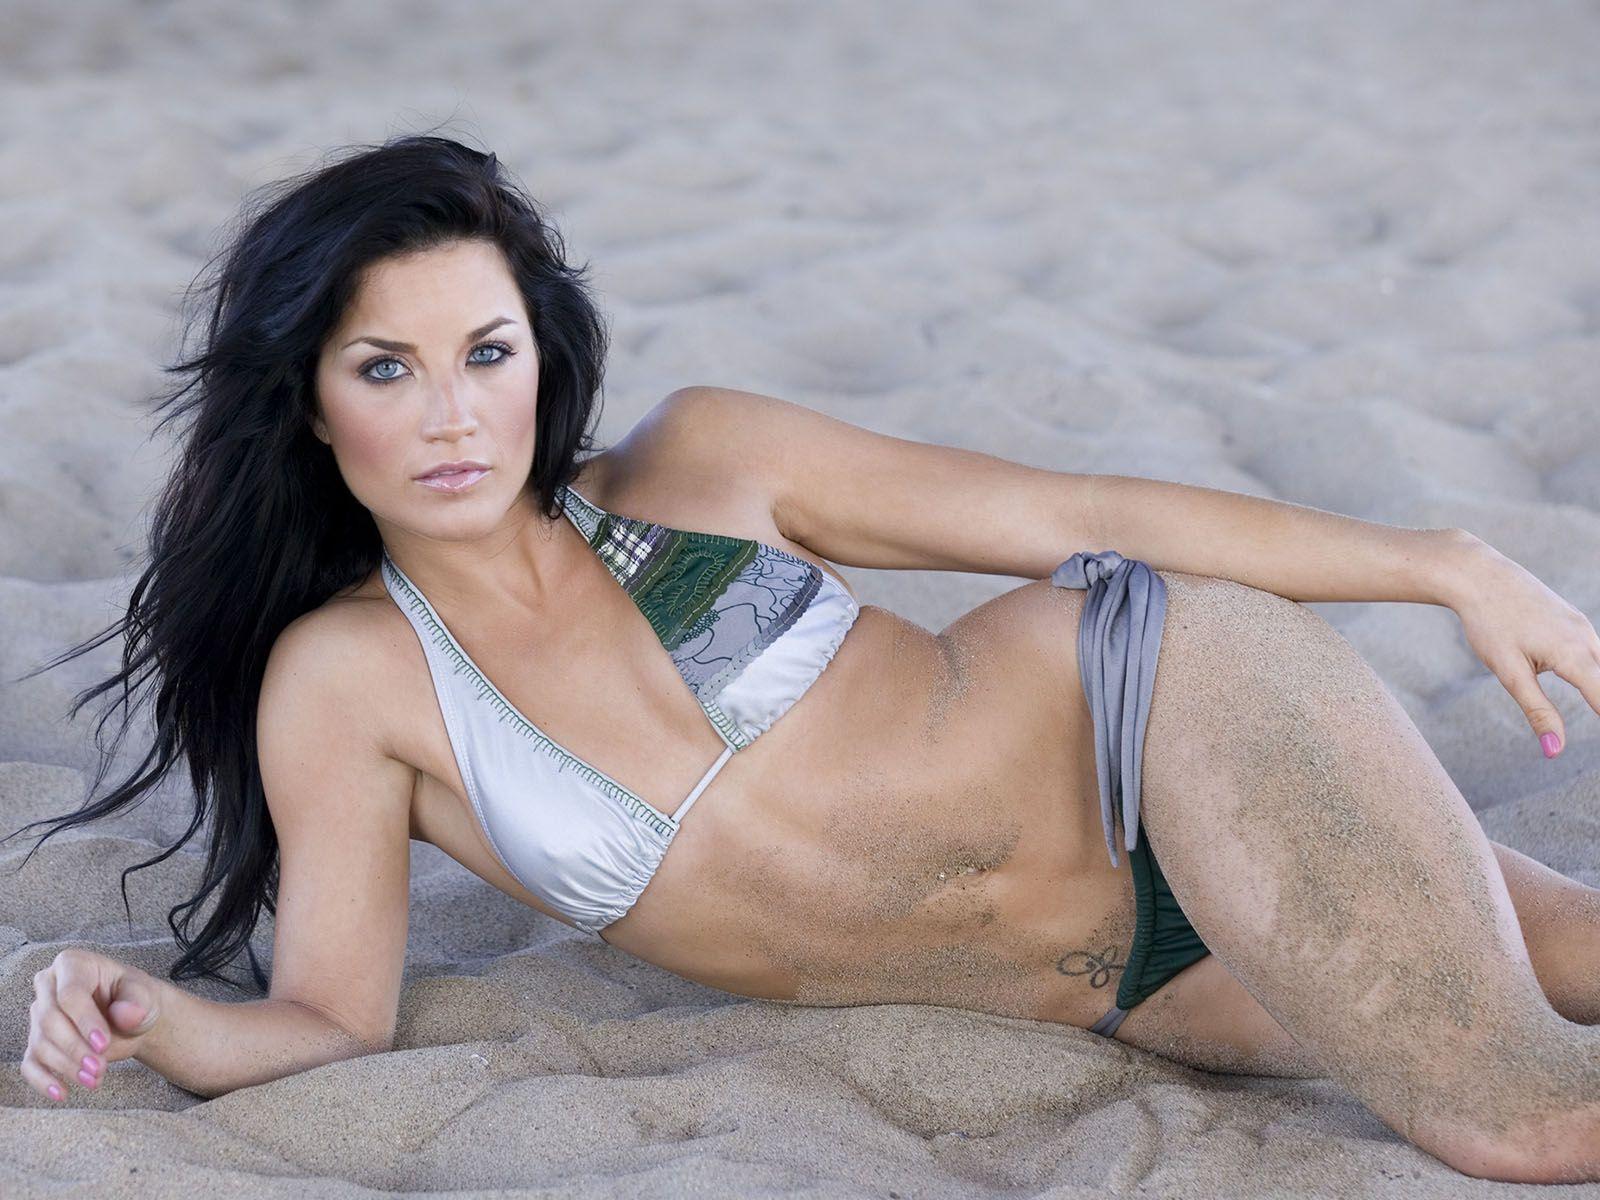 photo belle femme nue escort girl alençon